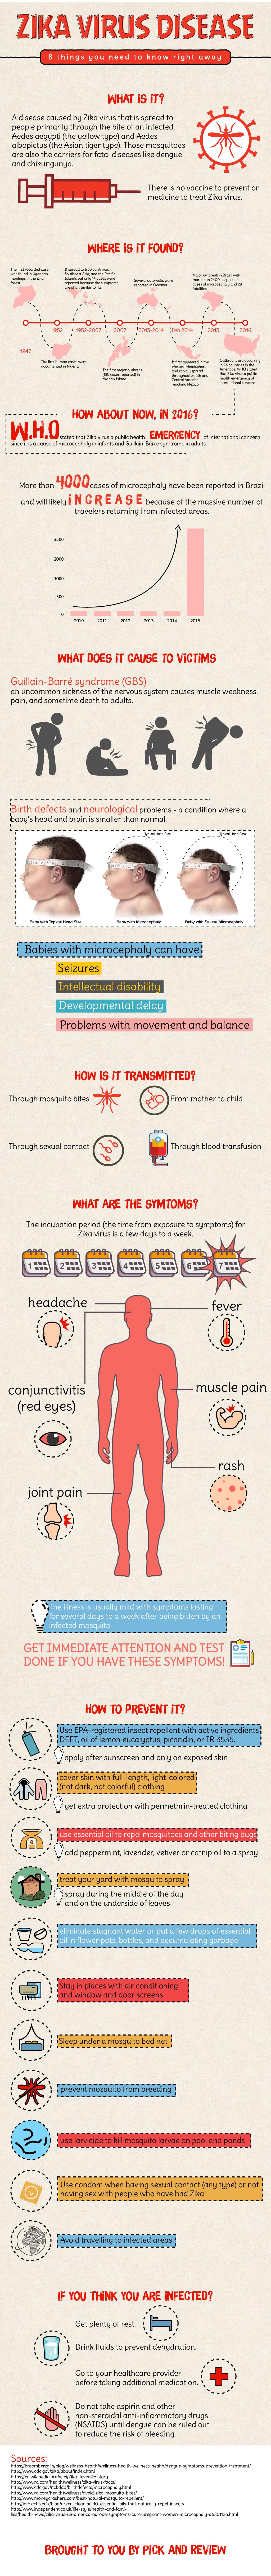 8 Things Everybody Needs To Know Zika Virus Disease Infographic